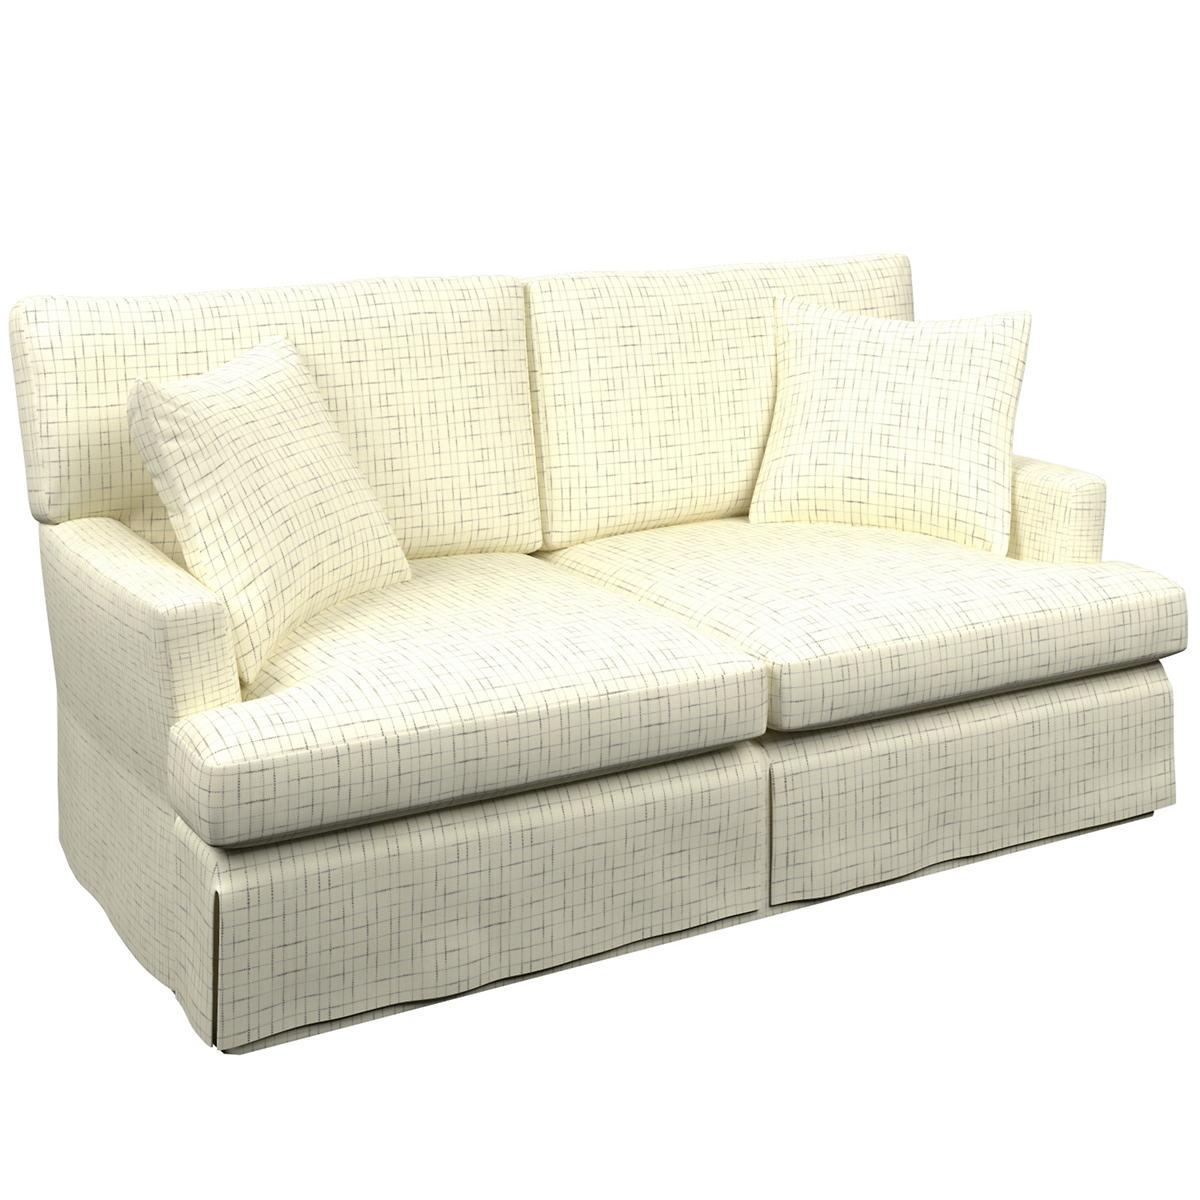 Nicholson Grey Saybrook 2 Seater Slipcovered Sofa